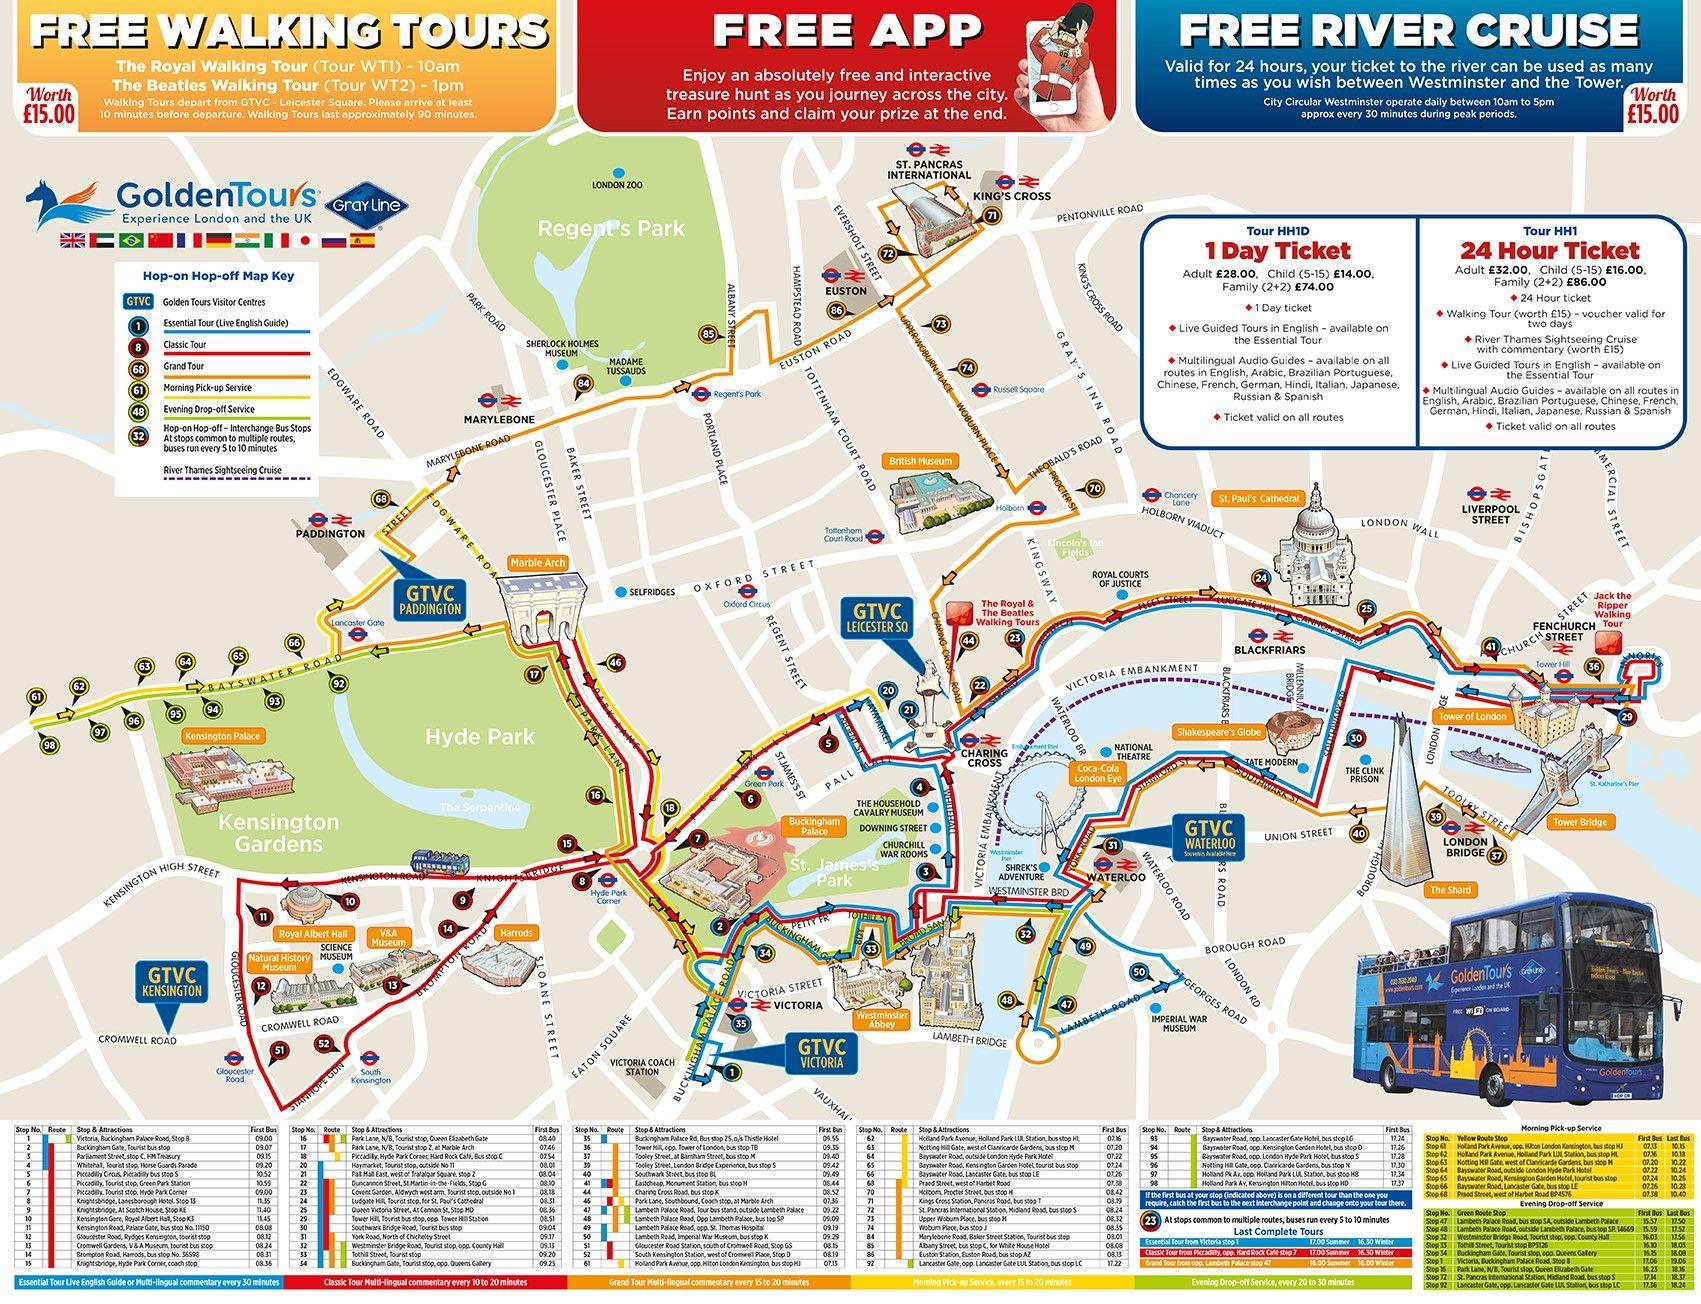 Hoho Map With Key 2018 Jpg 1 701 1 304 Pixels Londres Viajes